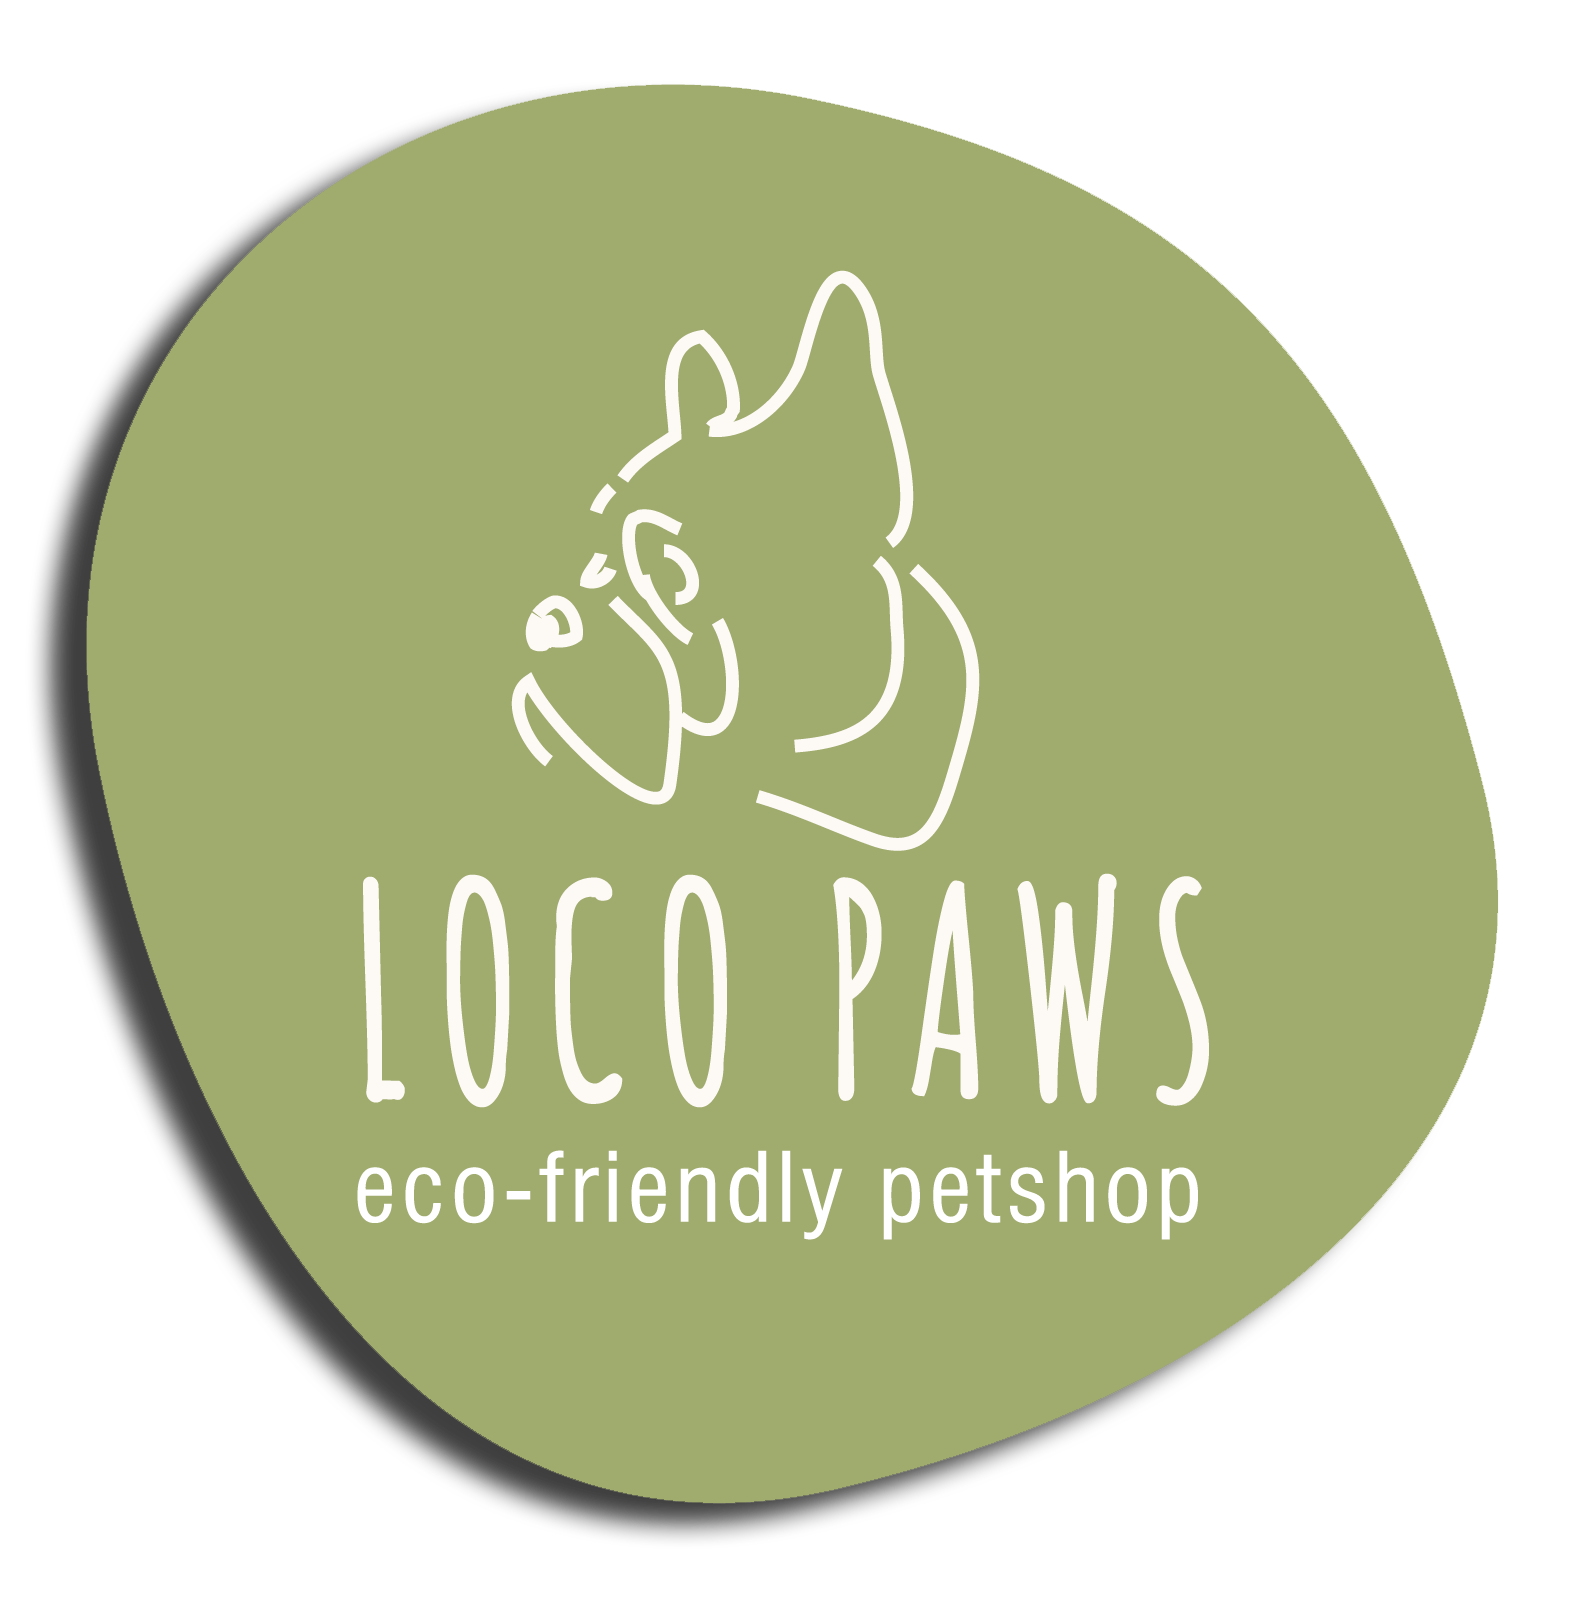 Loco Paws